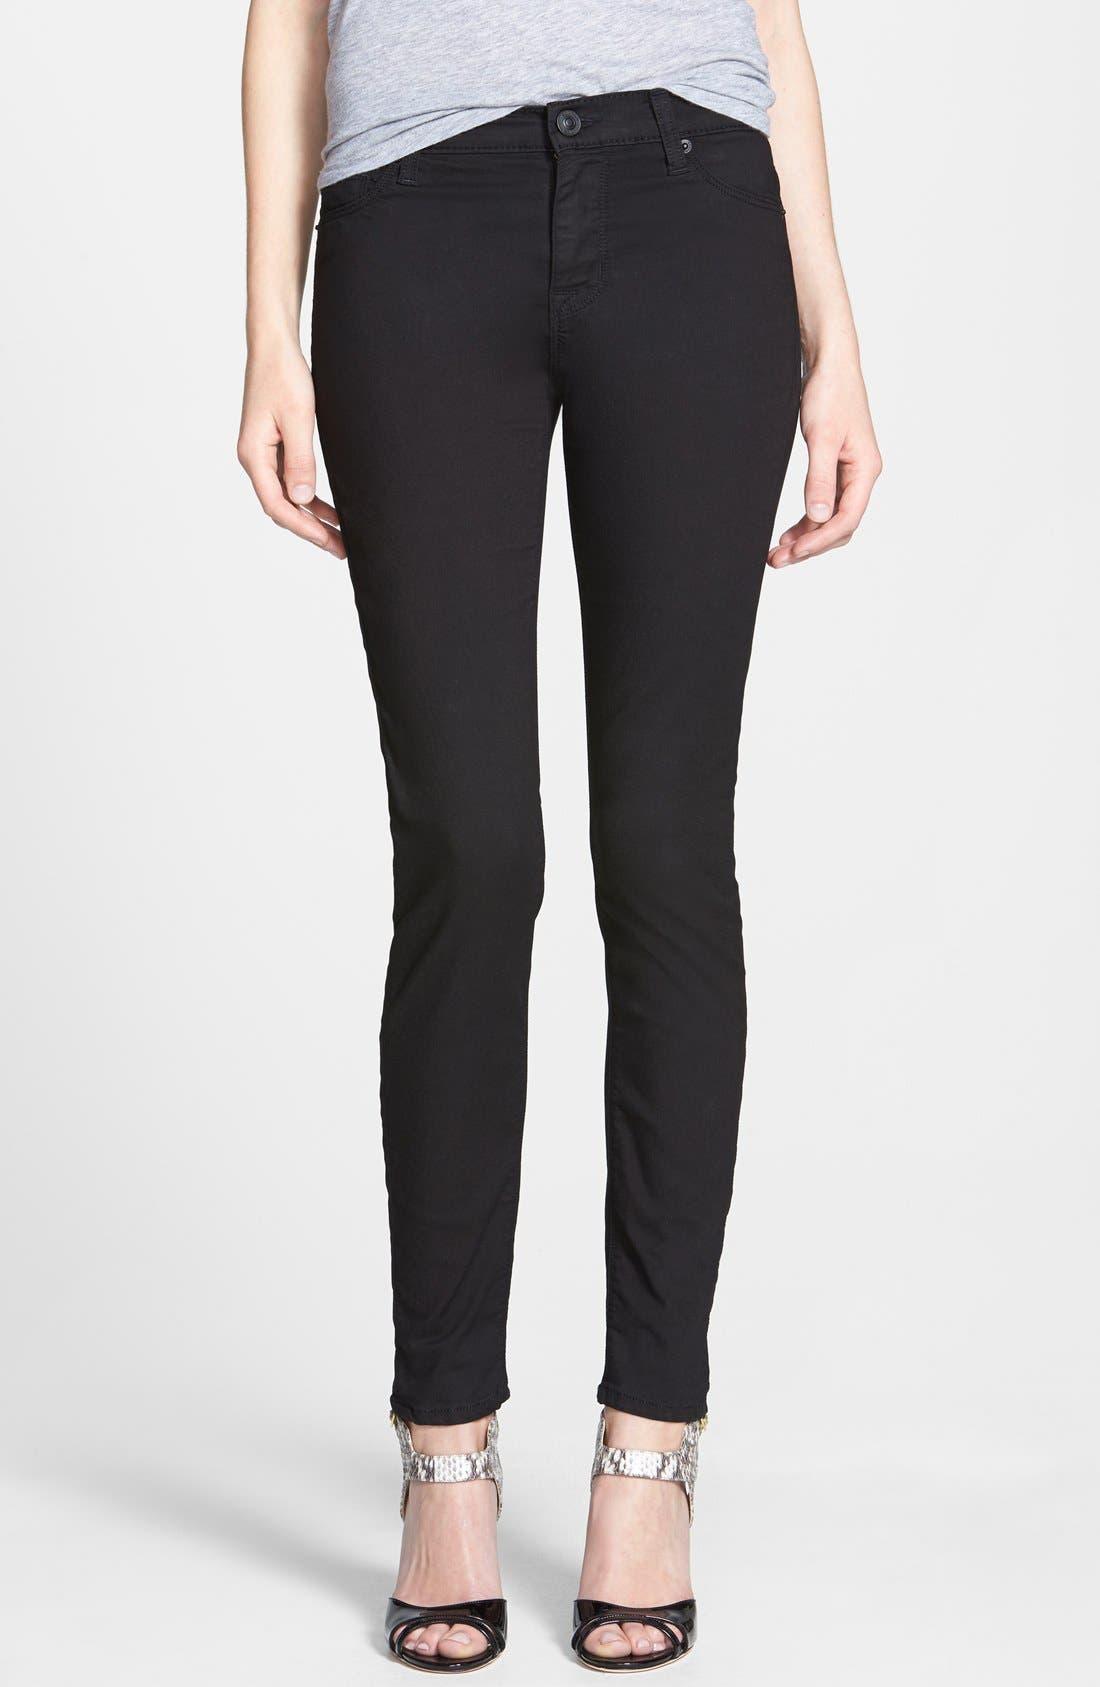 Main Image - Hudson Jeans 'Nico' Super Skinny Jeans (Melancholy)